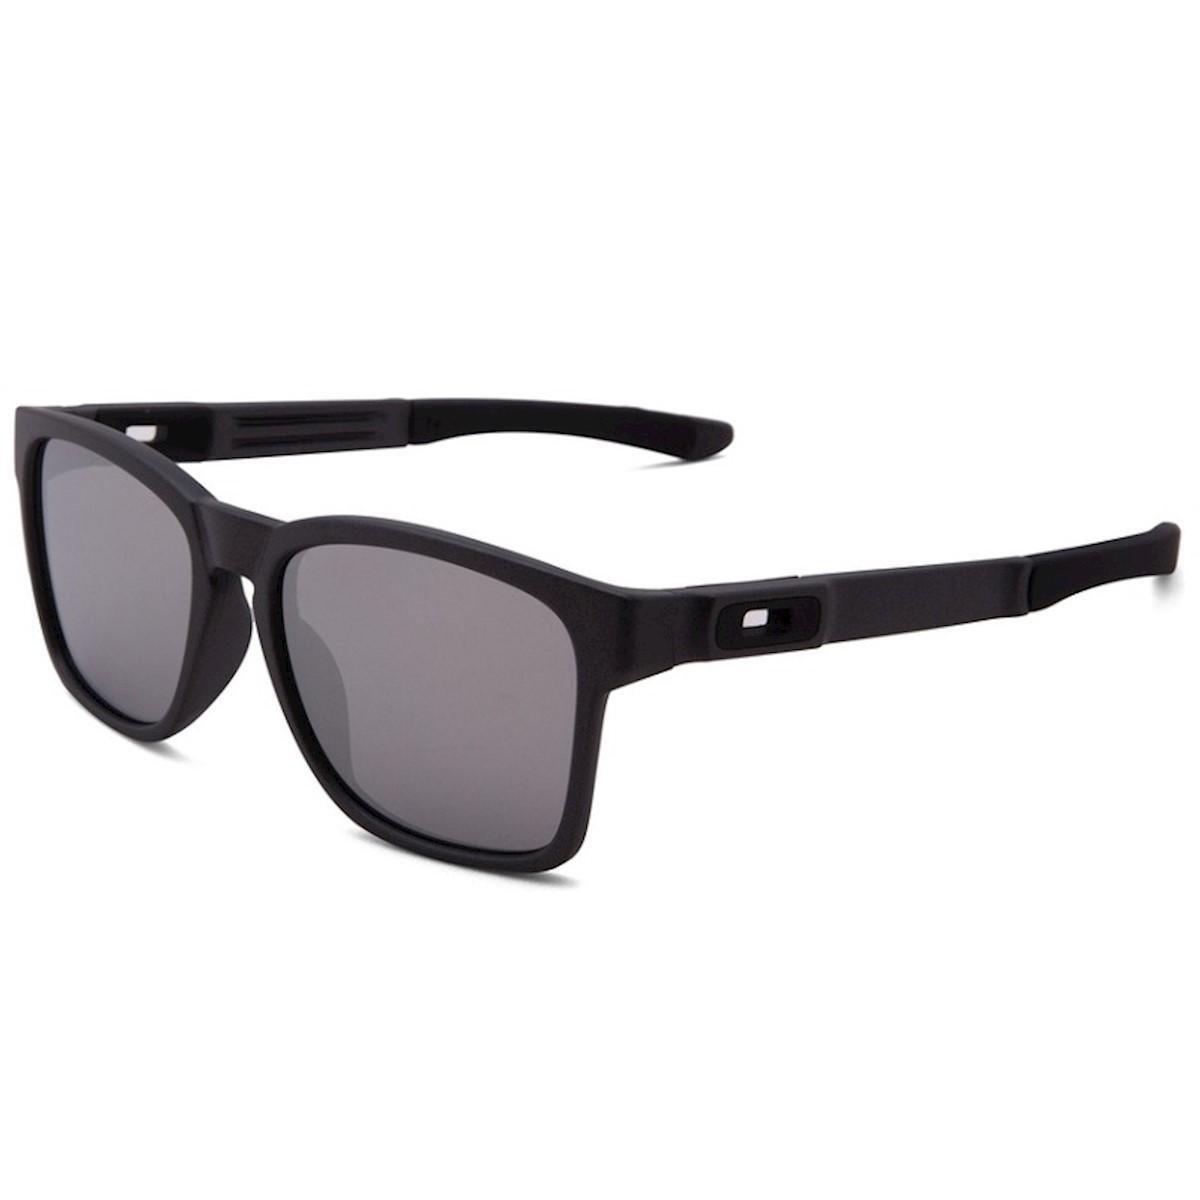 Óculos Oakley Catalyst-Iridium - Preto e Cinza - Compre Agora   Netshoes 982d925e89